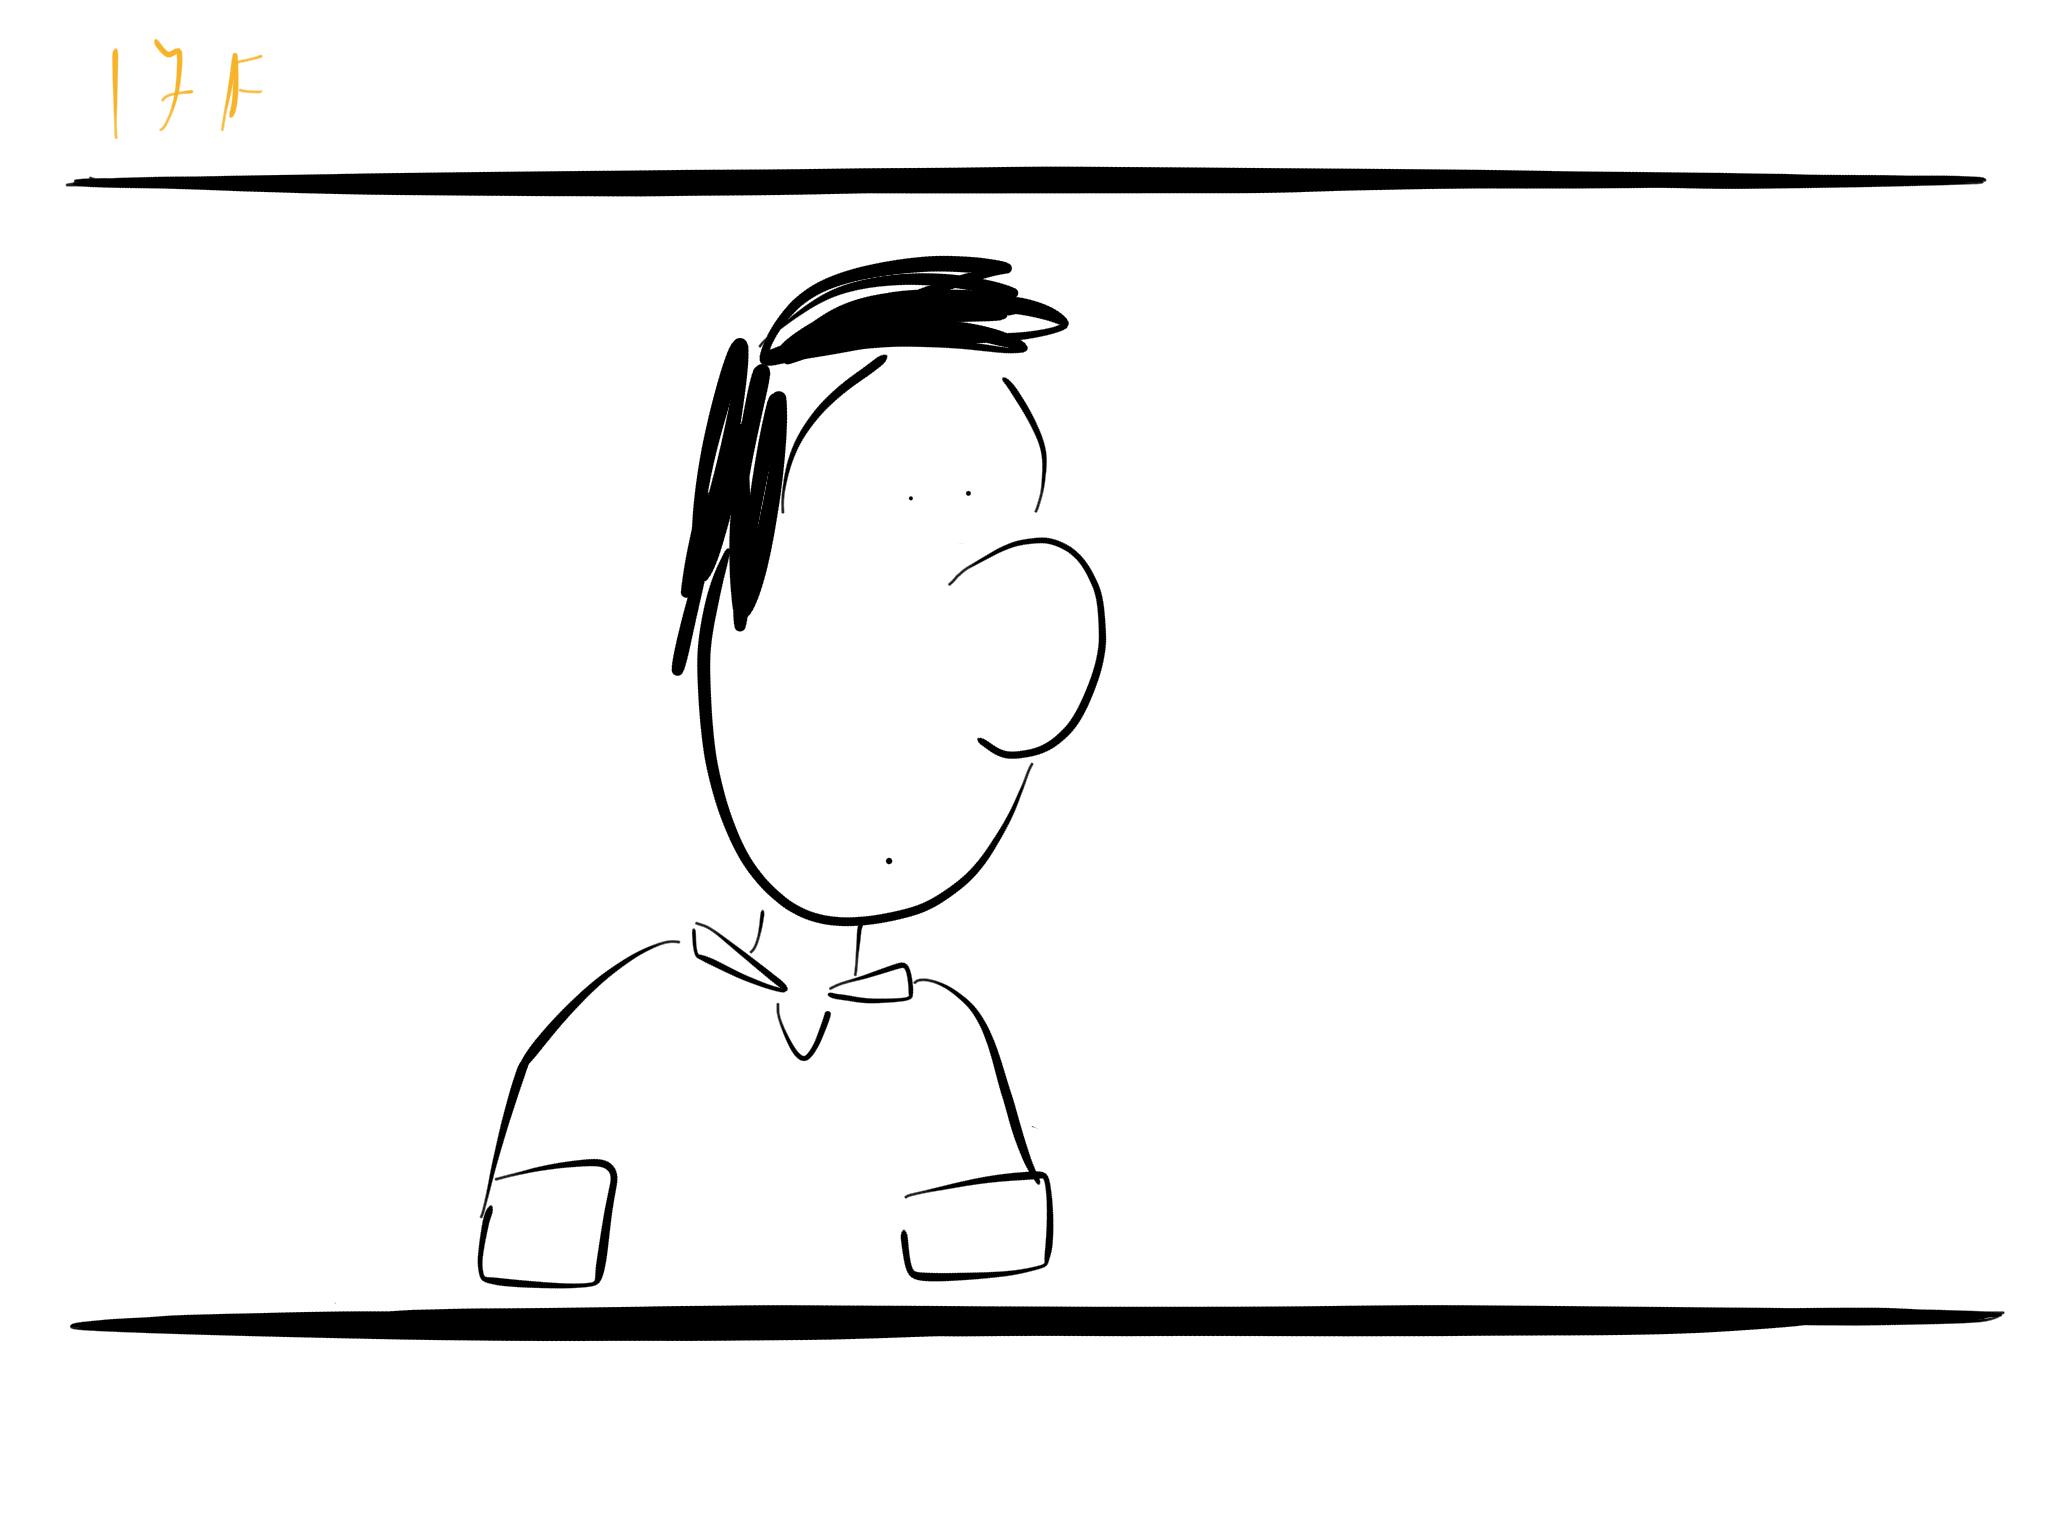 BDF_Storyboards_81.jpg